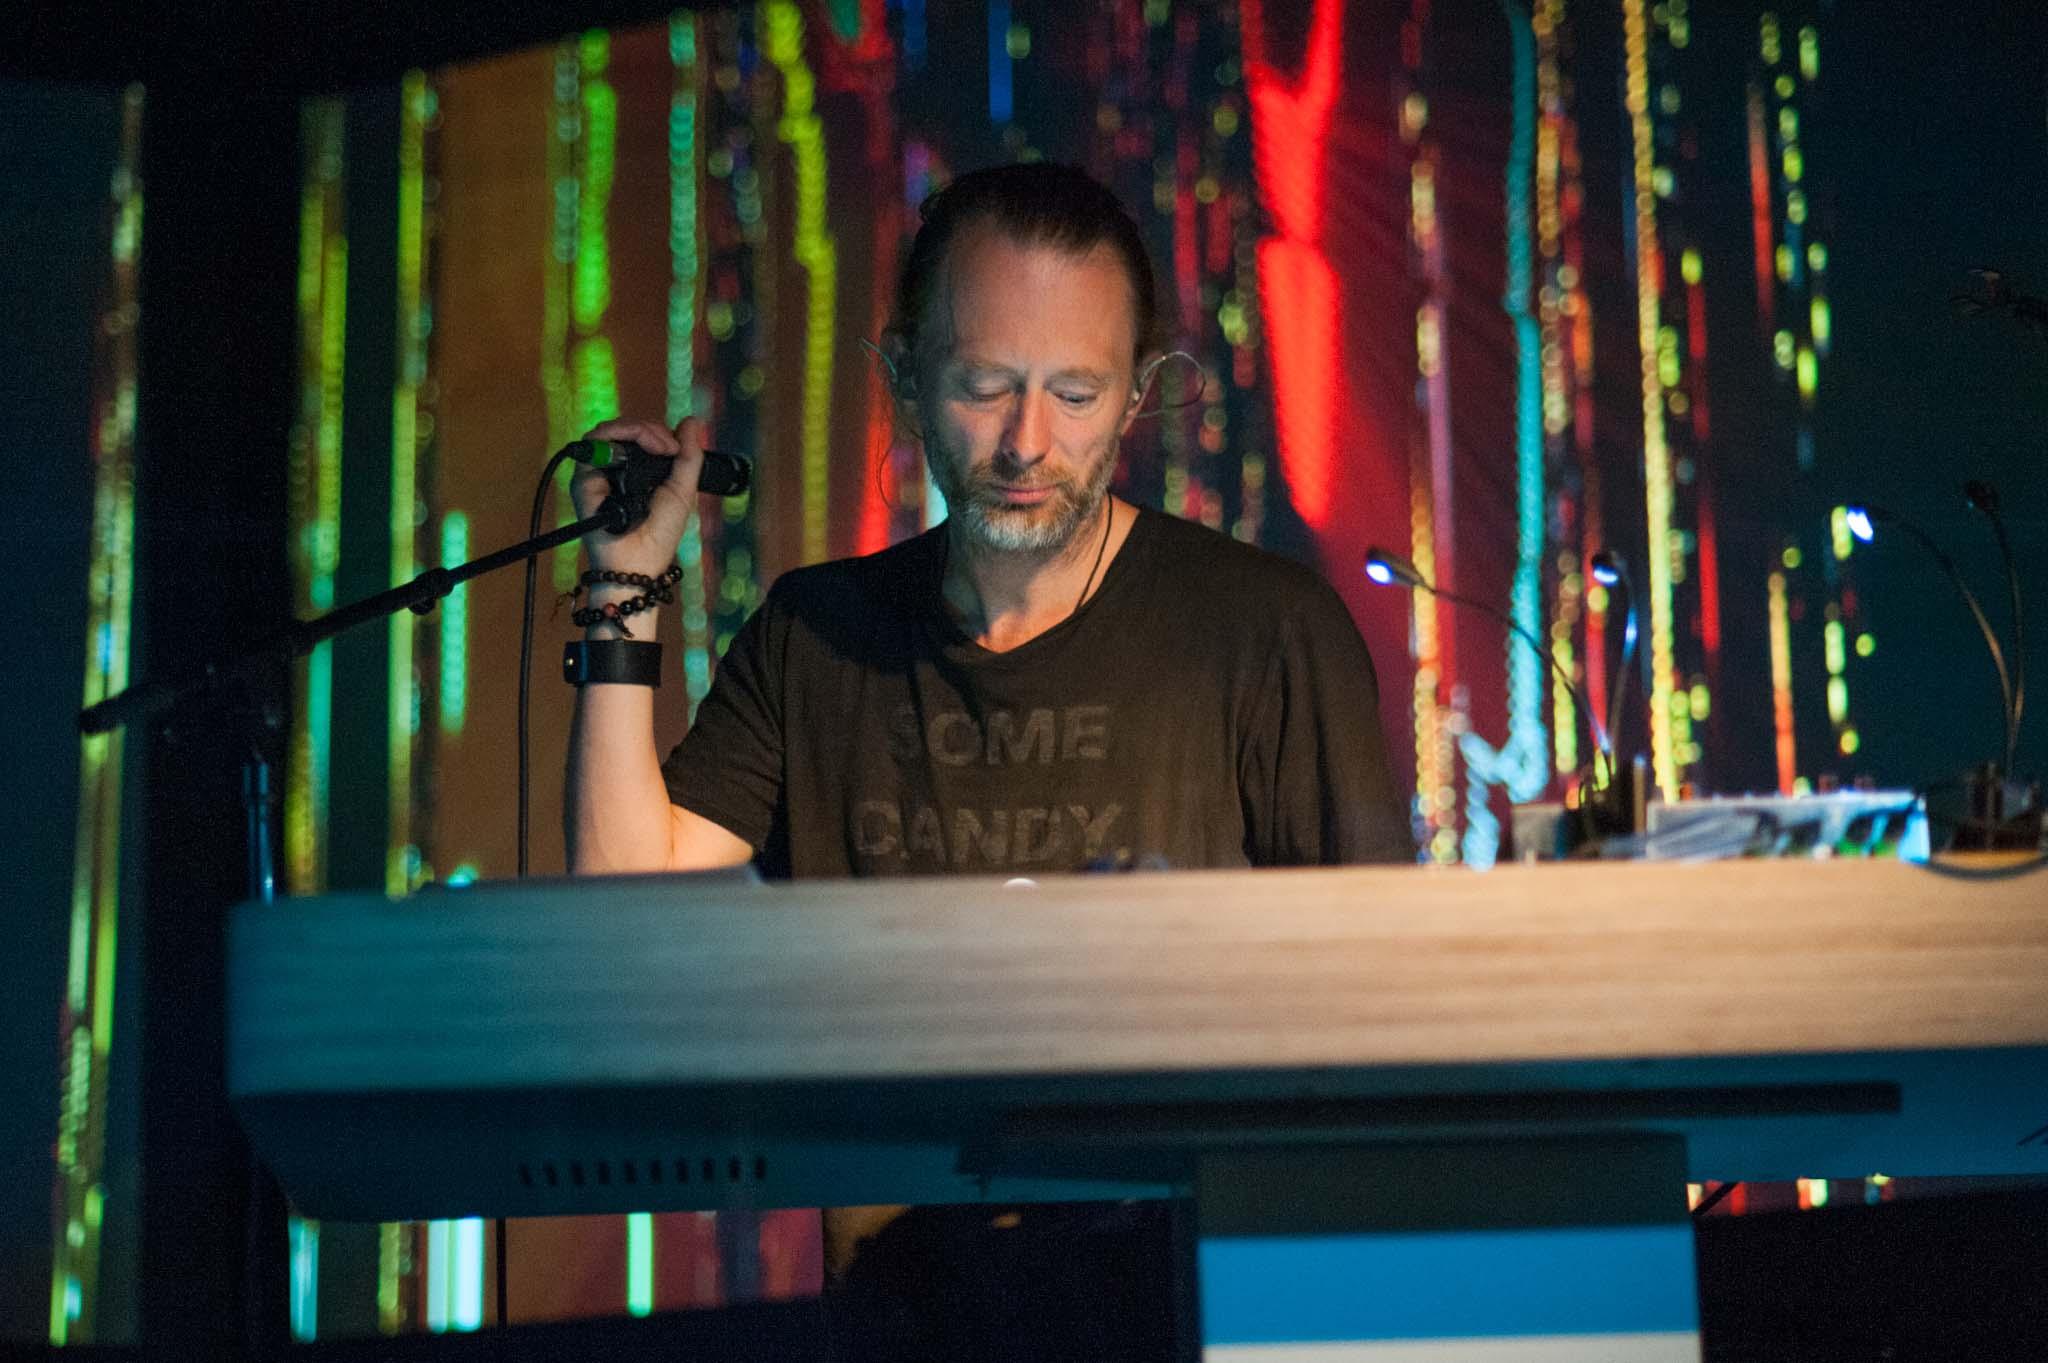 Listen to a teaser of Thom Yorke's new horror film score for 'Suspiria'